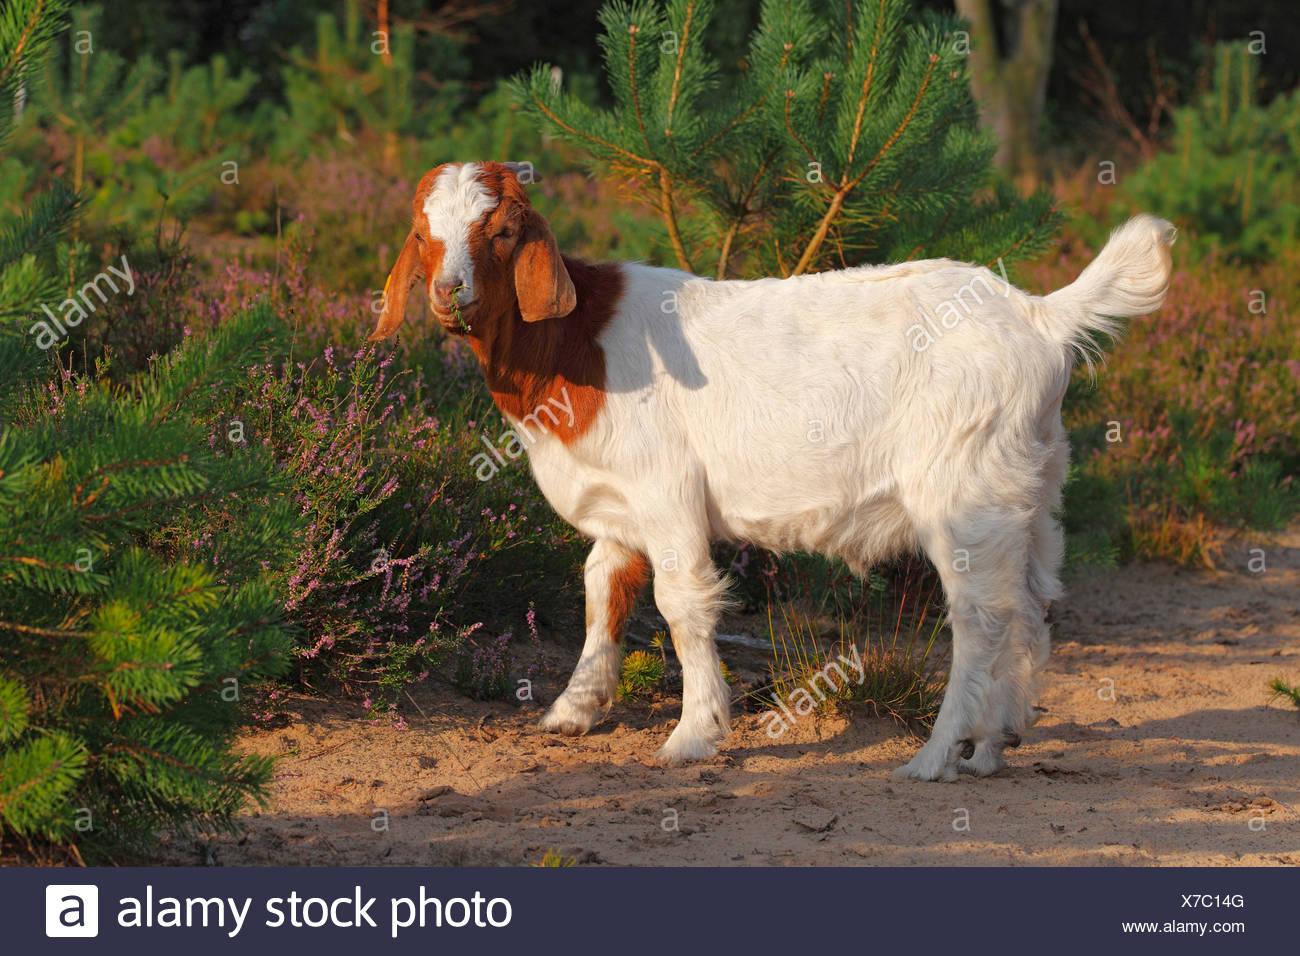 Boer goat, robust goat breed for extensive landscaping, Schleswig-Holstein, Germany - Stock Image